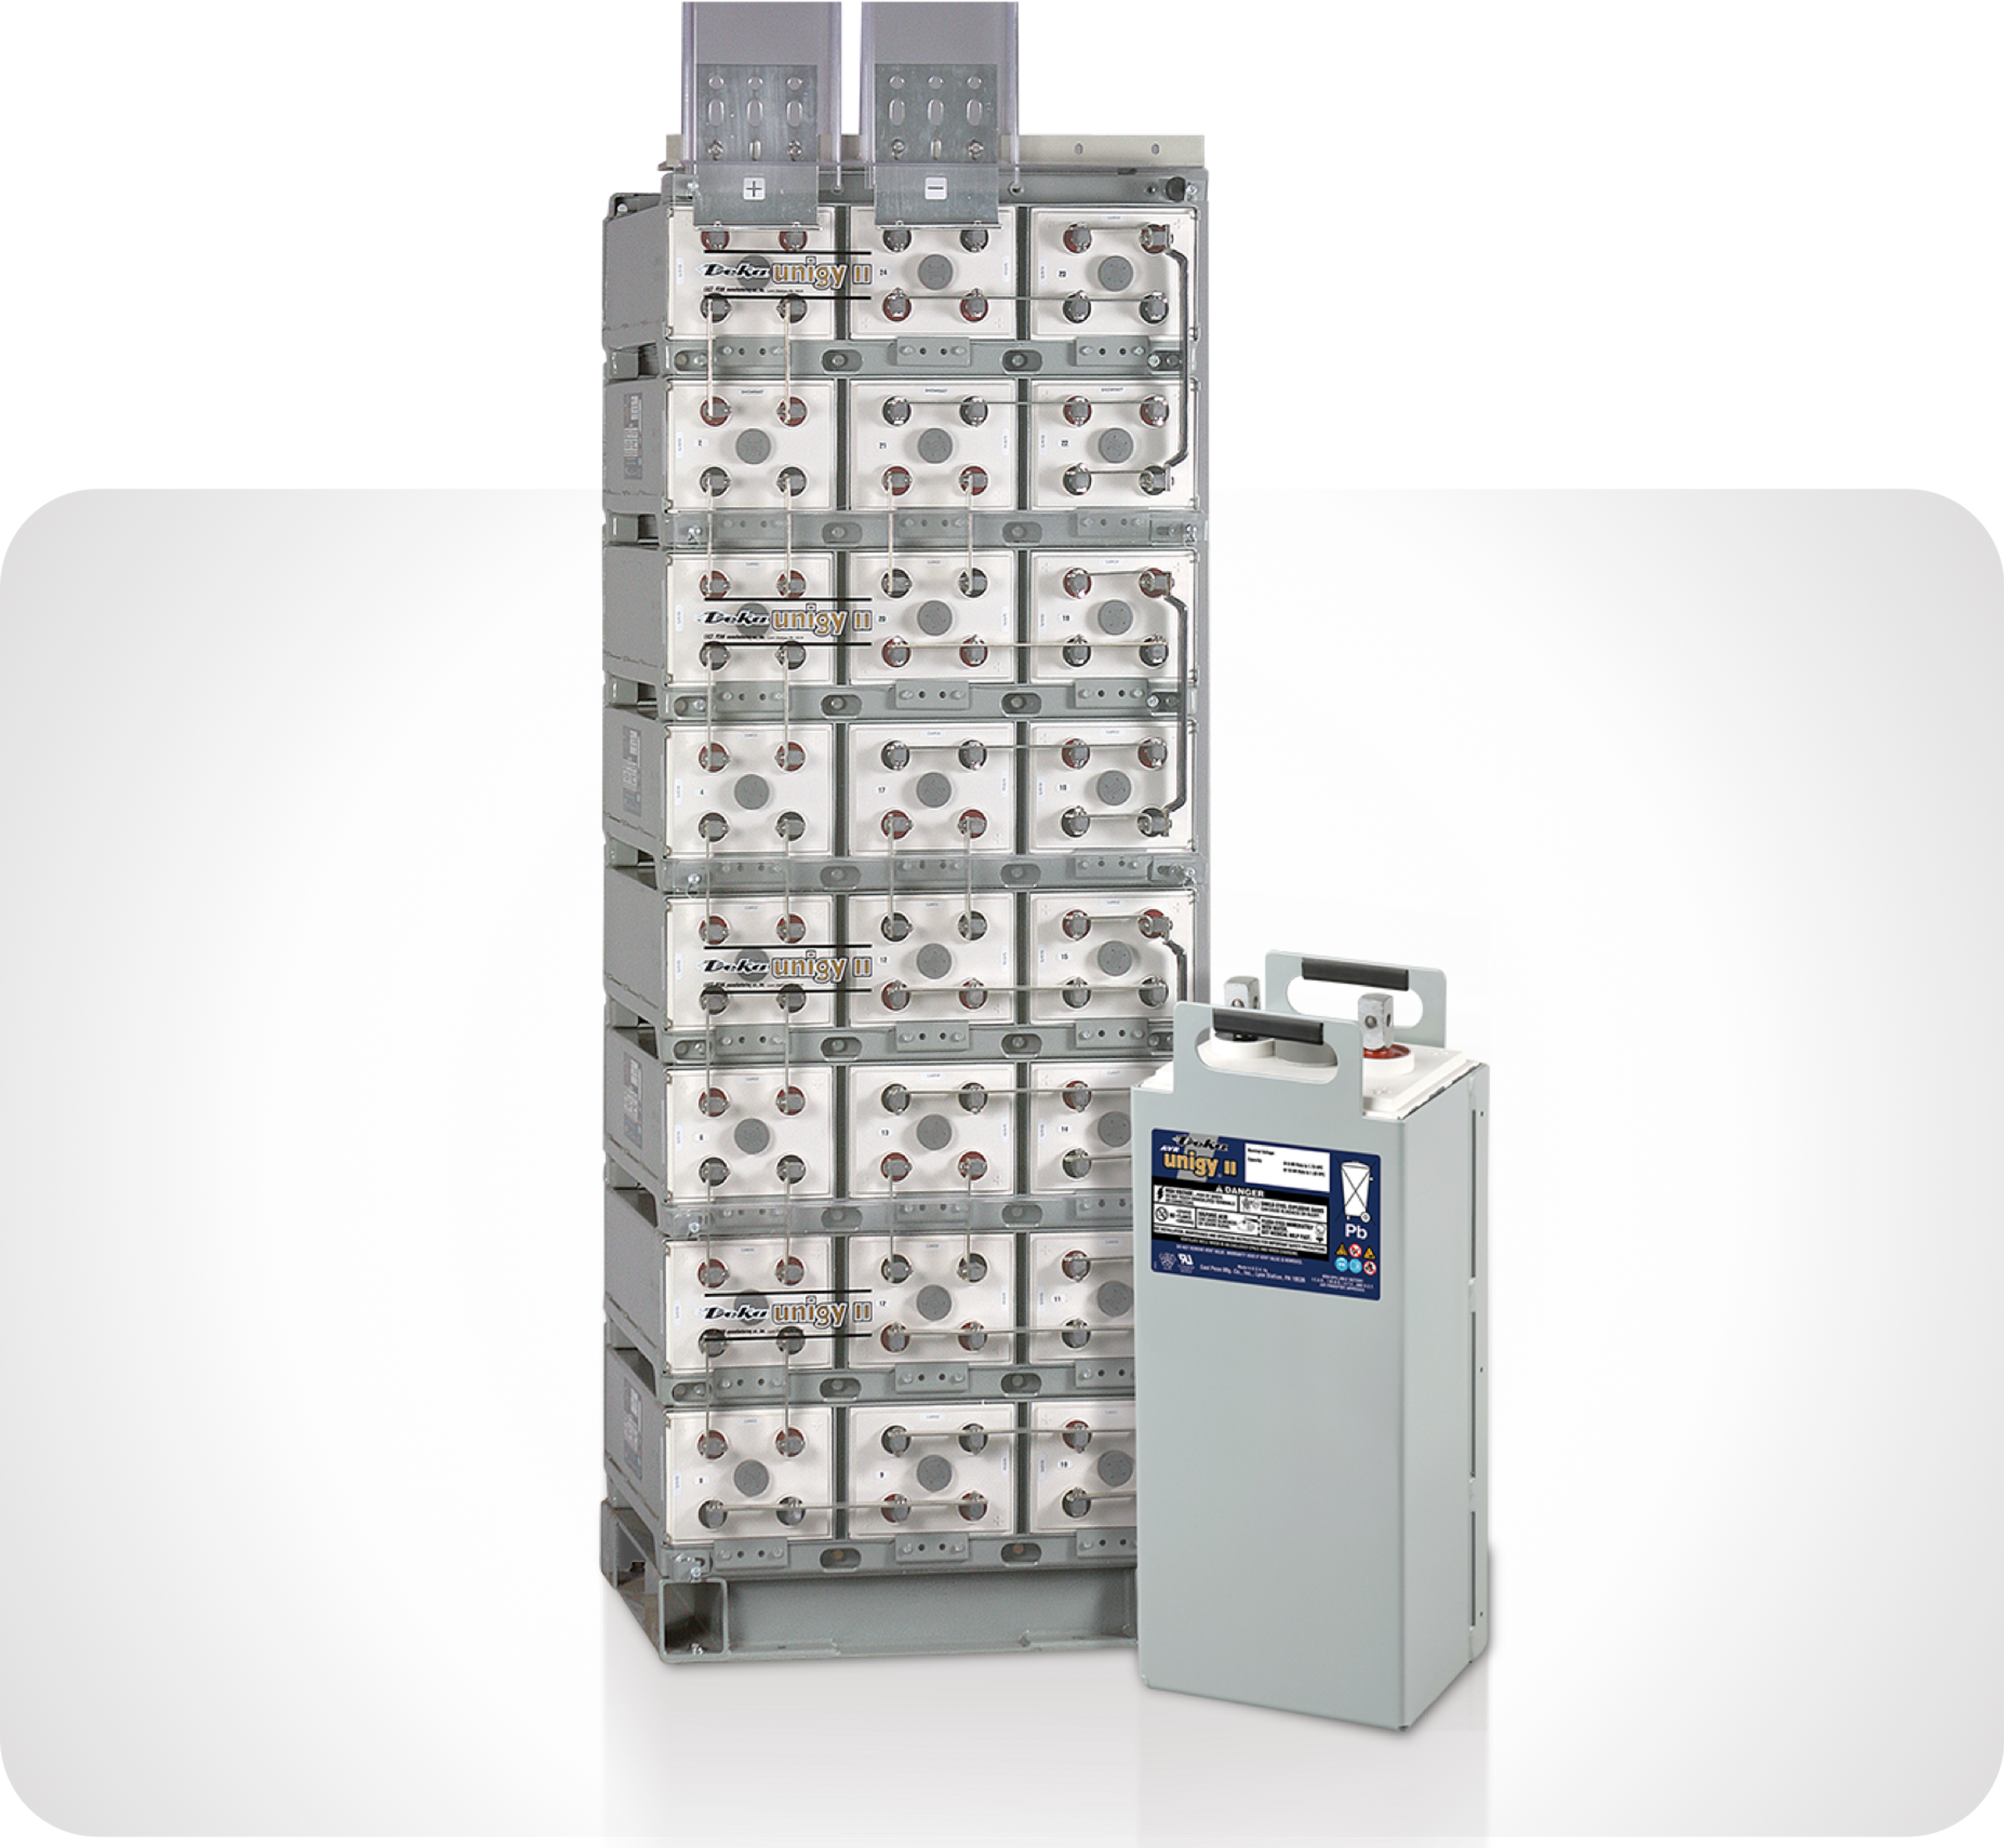 Pictire of Deka Unigy II Batteries